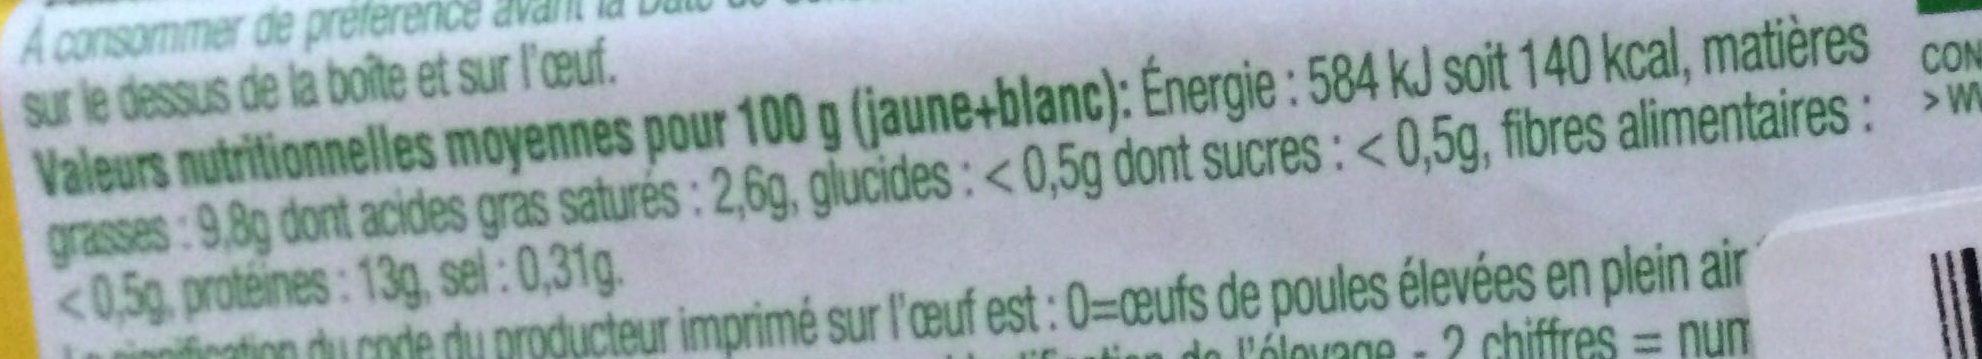 Oeufs Plein air Bio - Informations nutritionnelles - fr